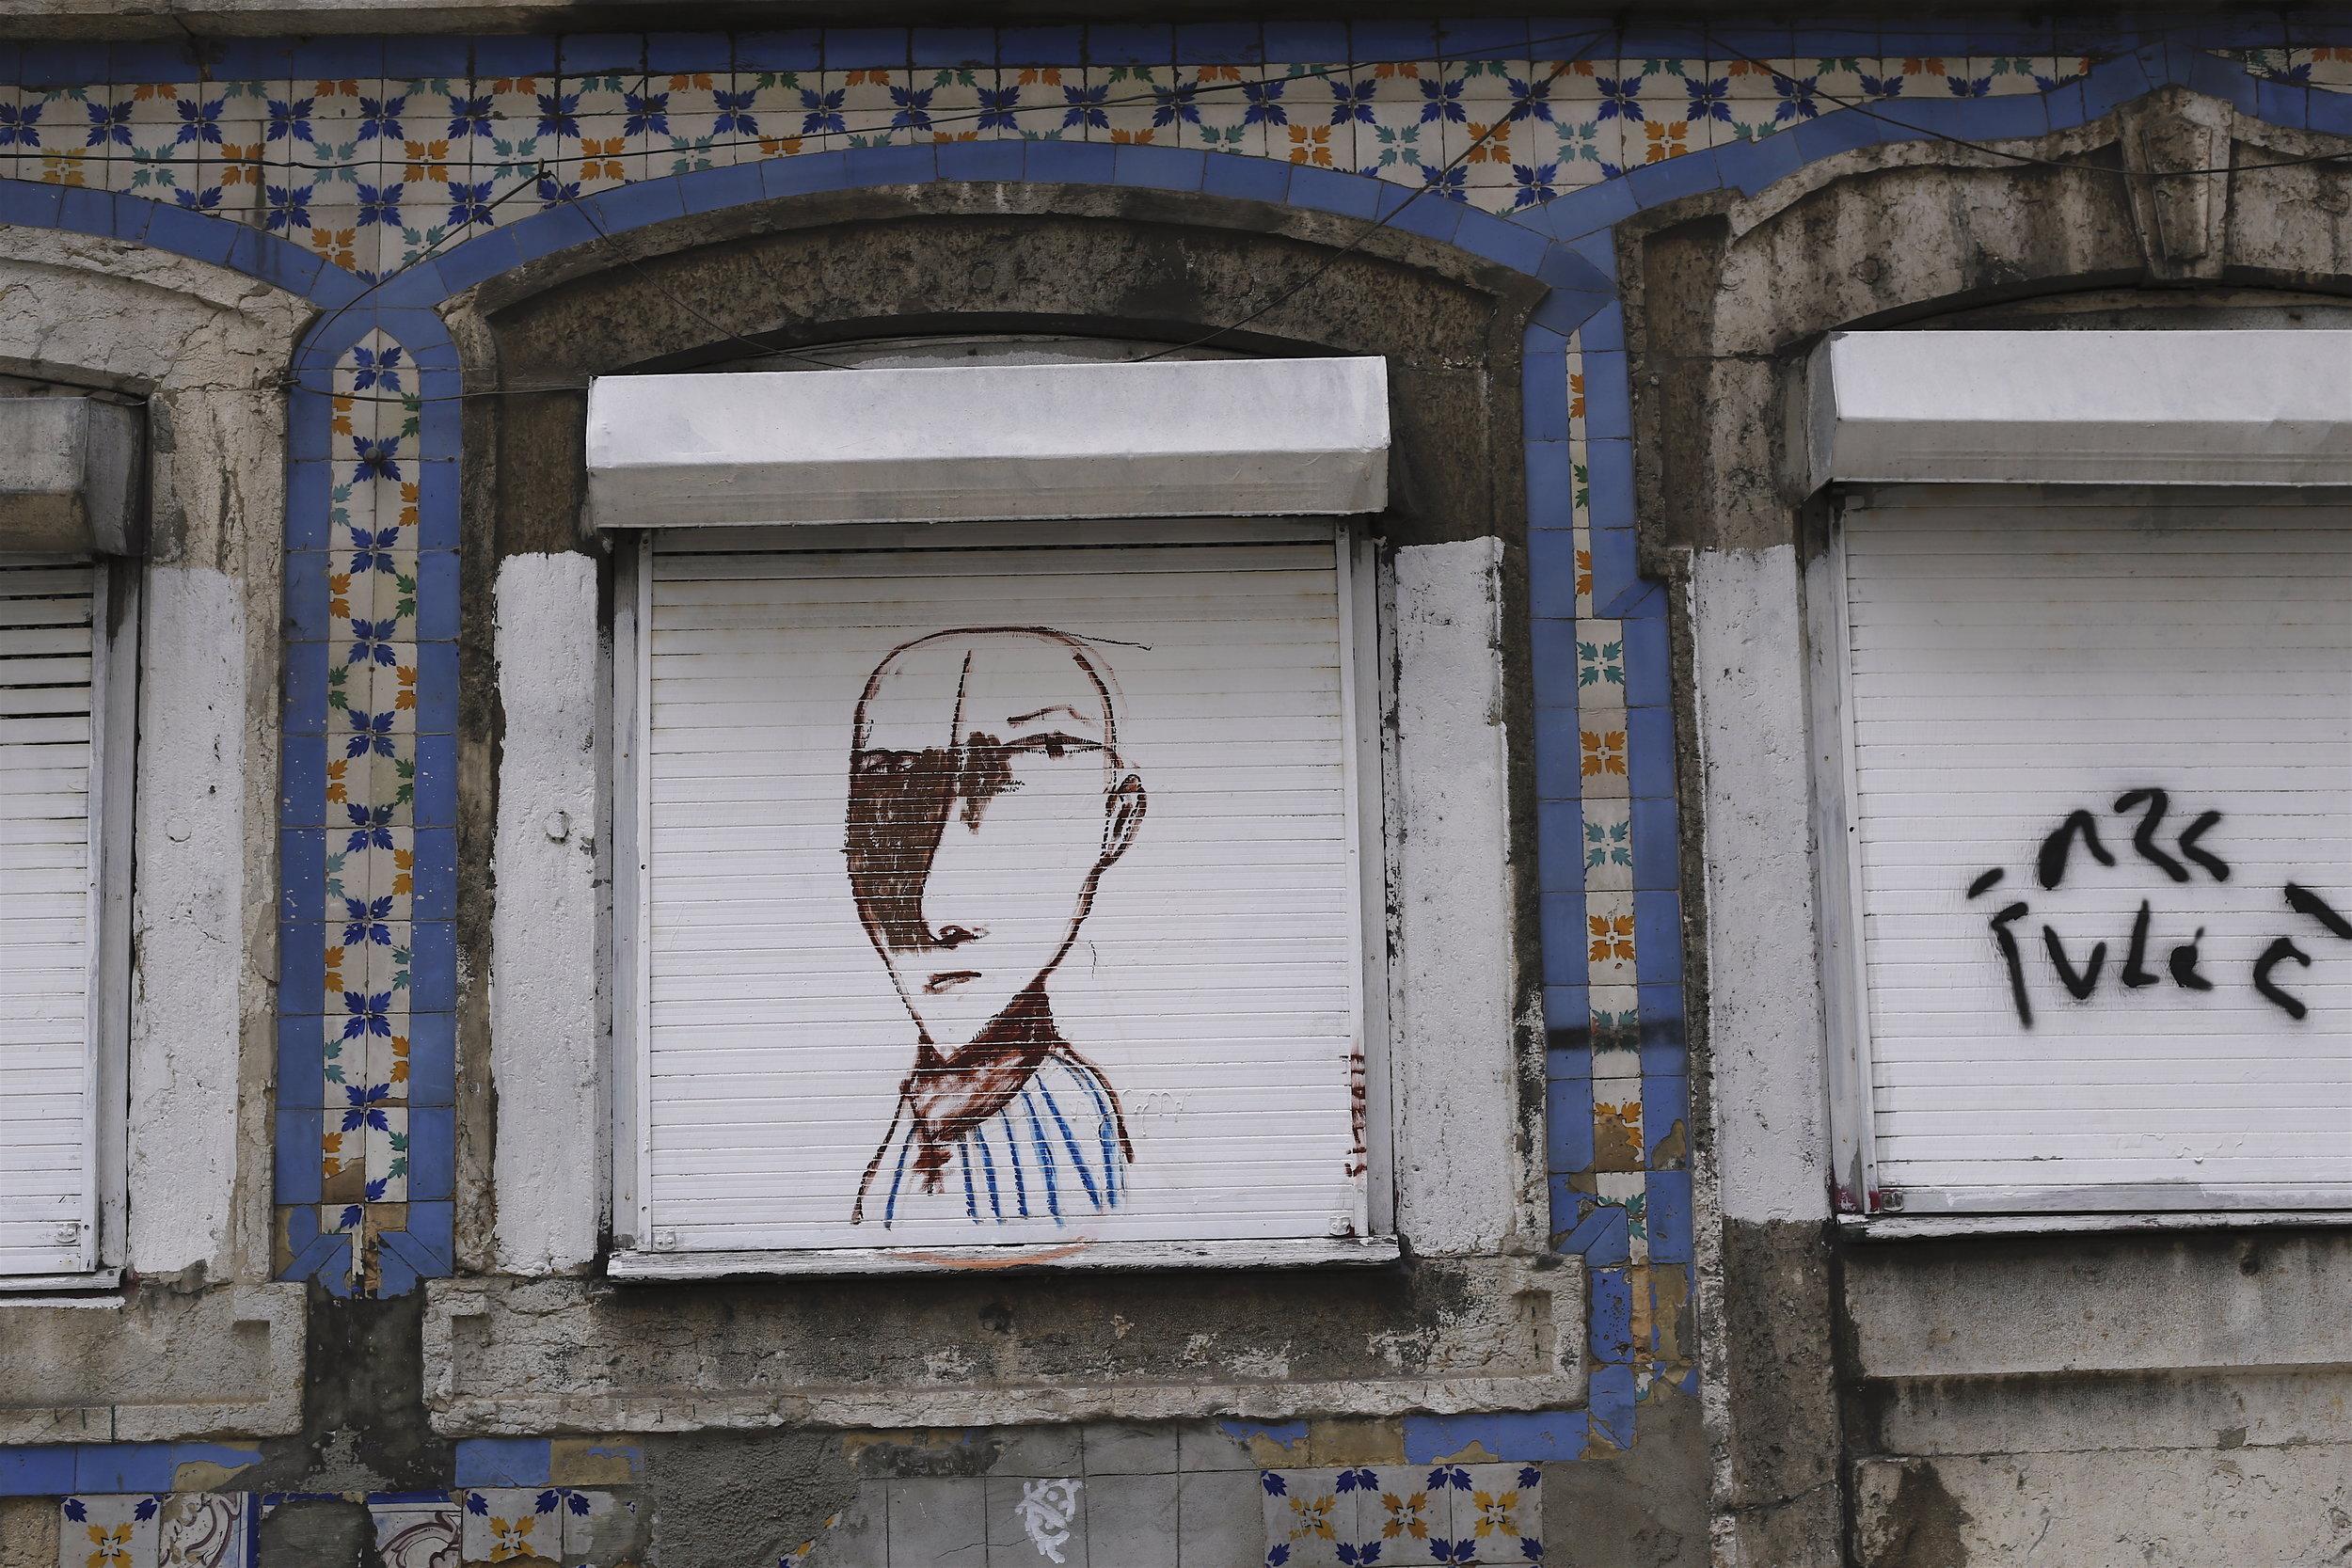 Lisbon street art, photo by Poppy Danis, 2017